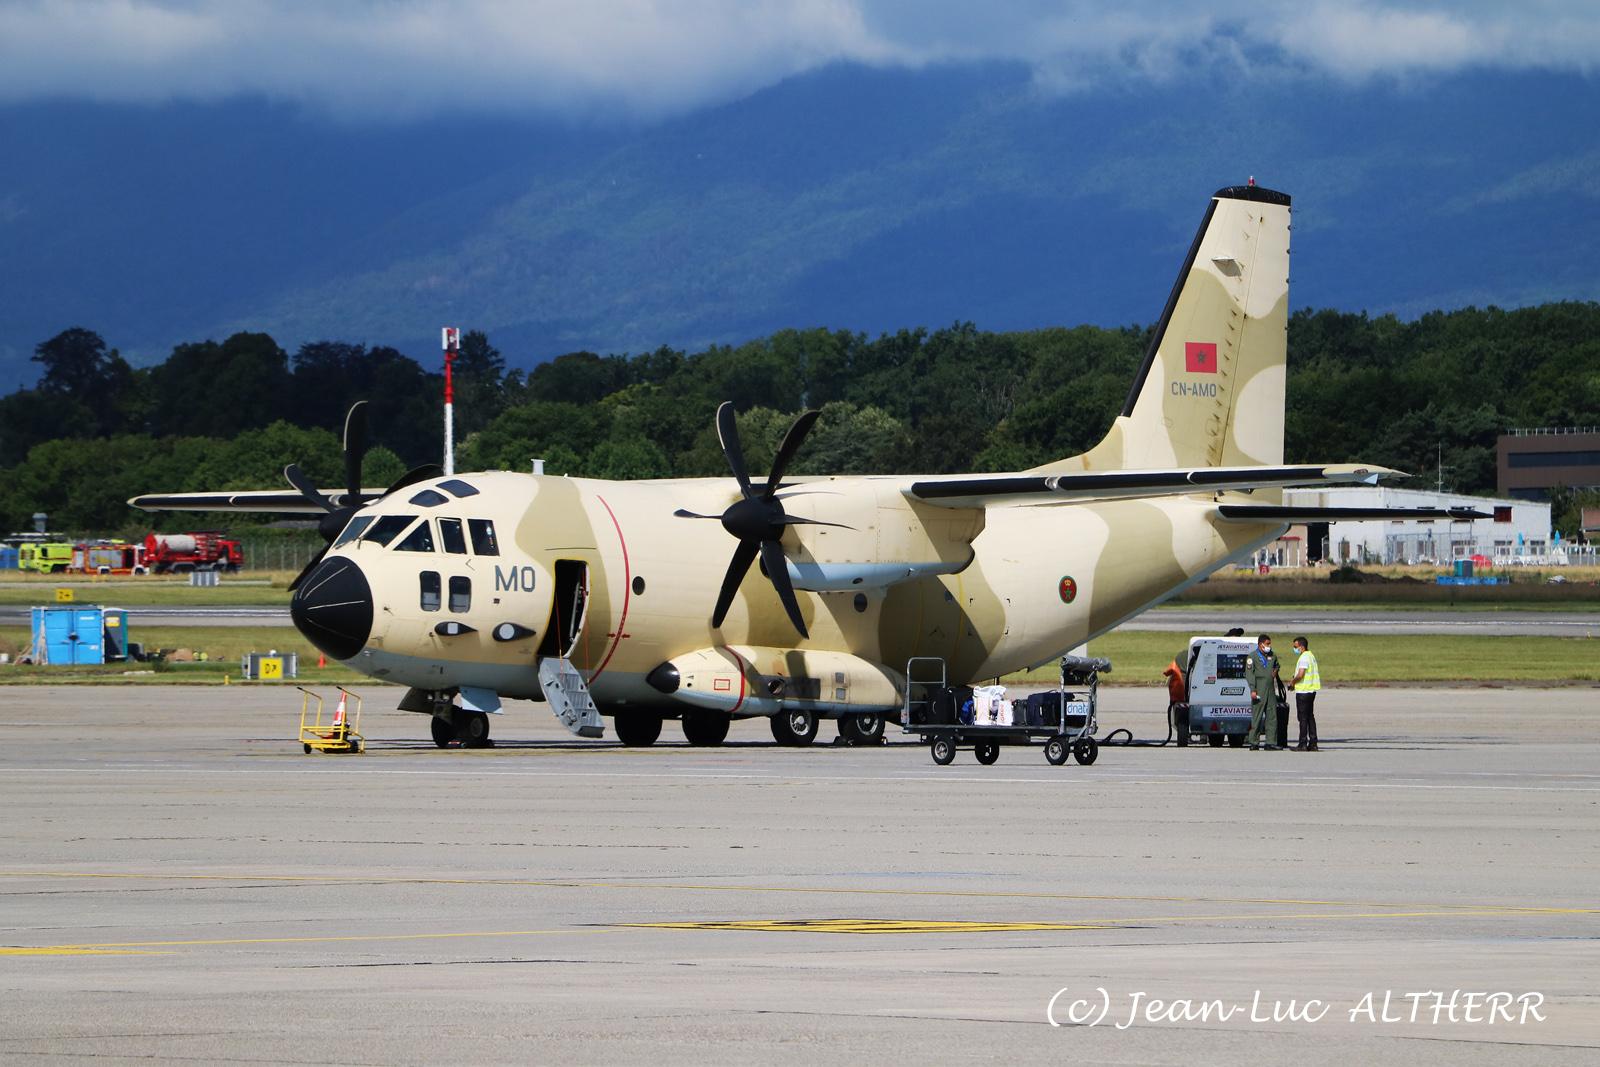 FRA: Photos d'avions de transport - Page 40 50099596298_1eff8742aa_o_d